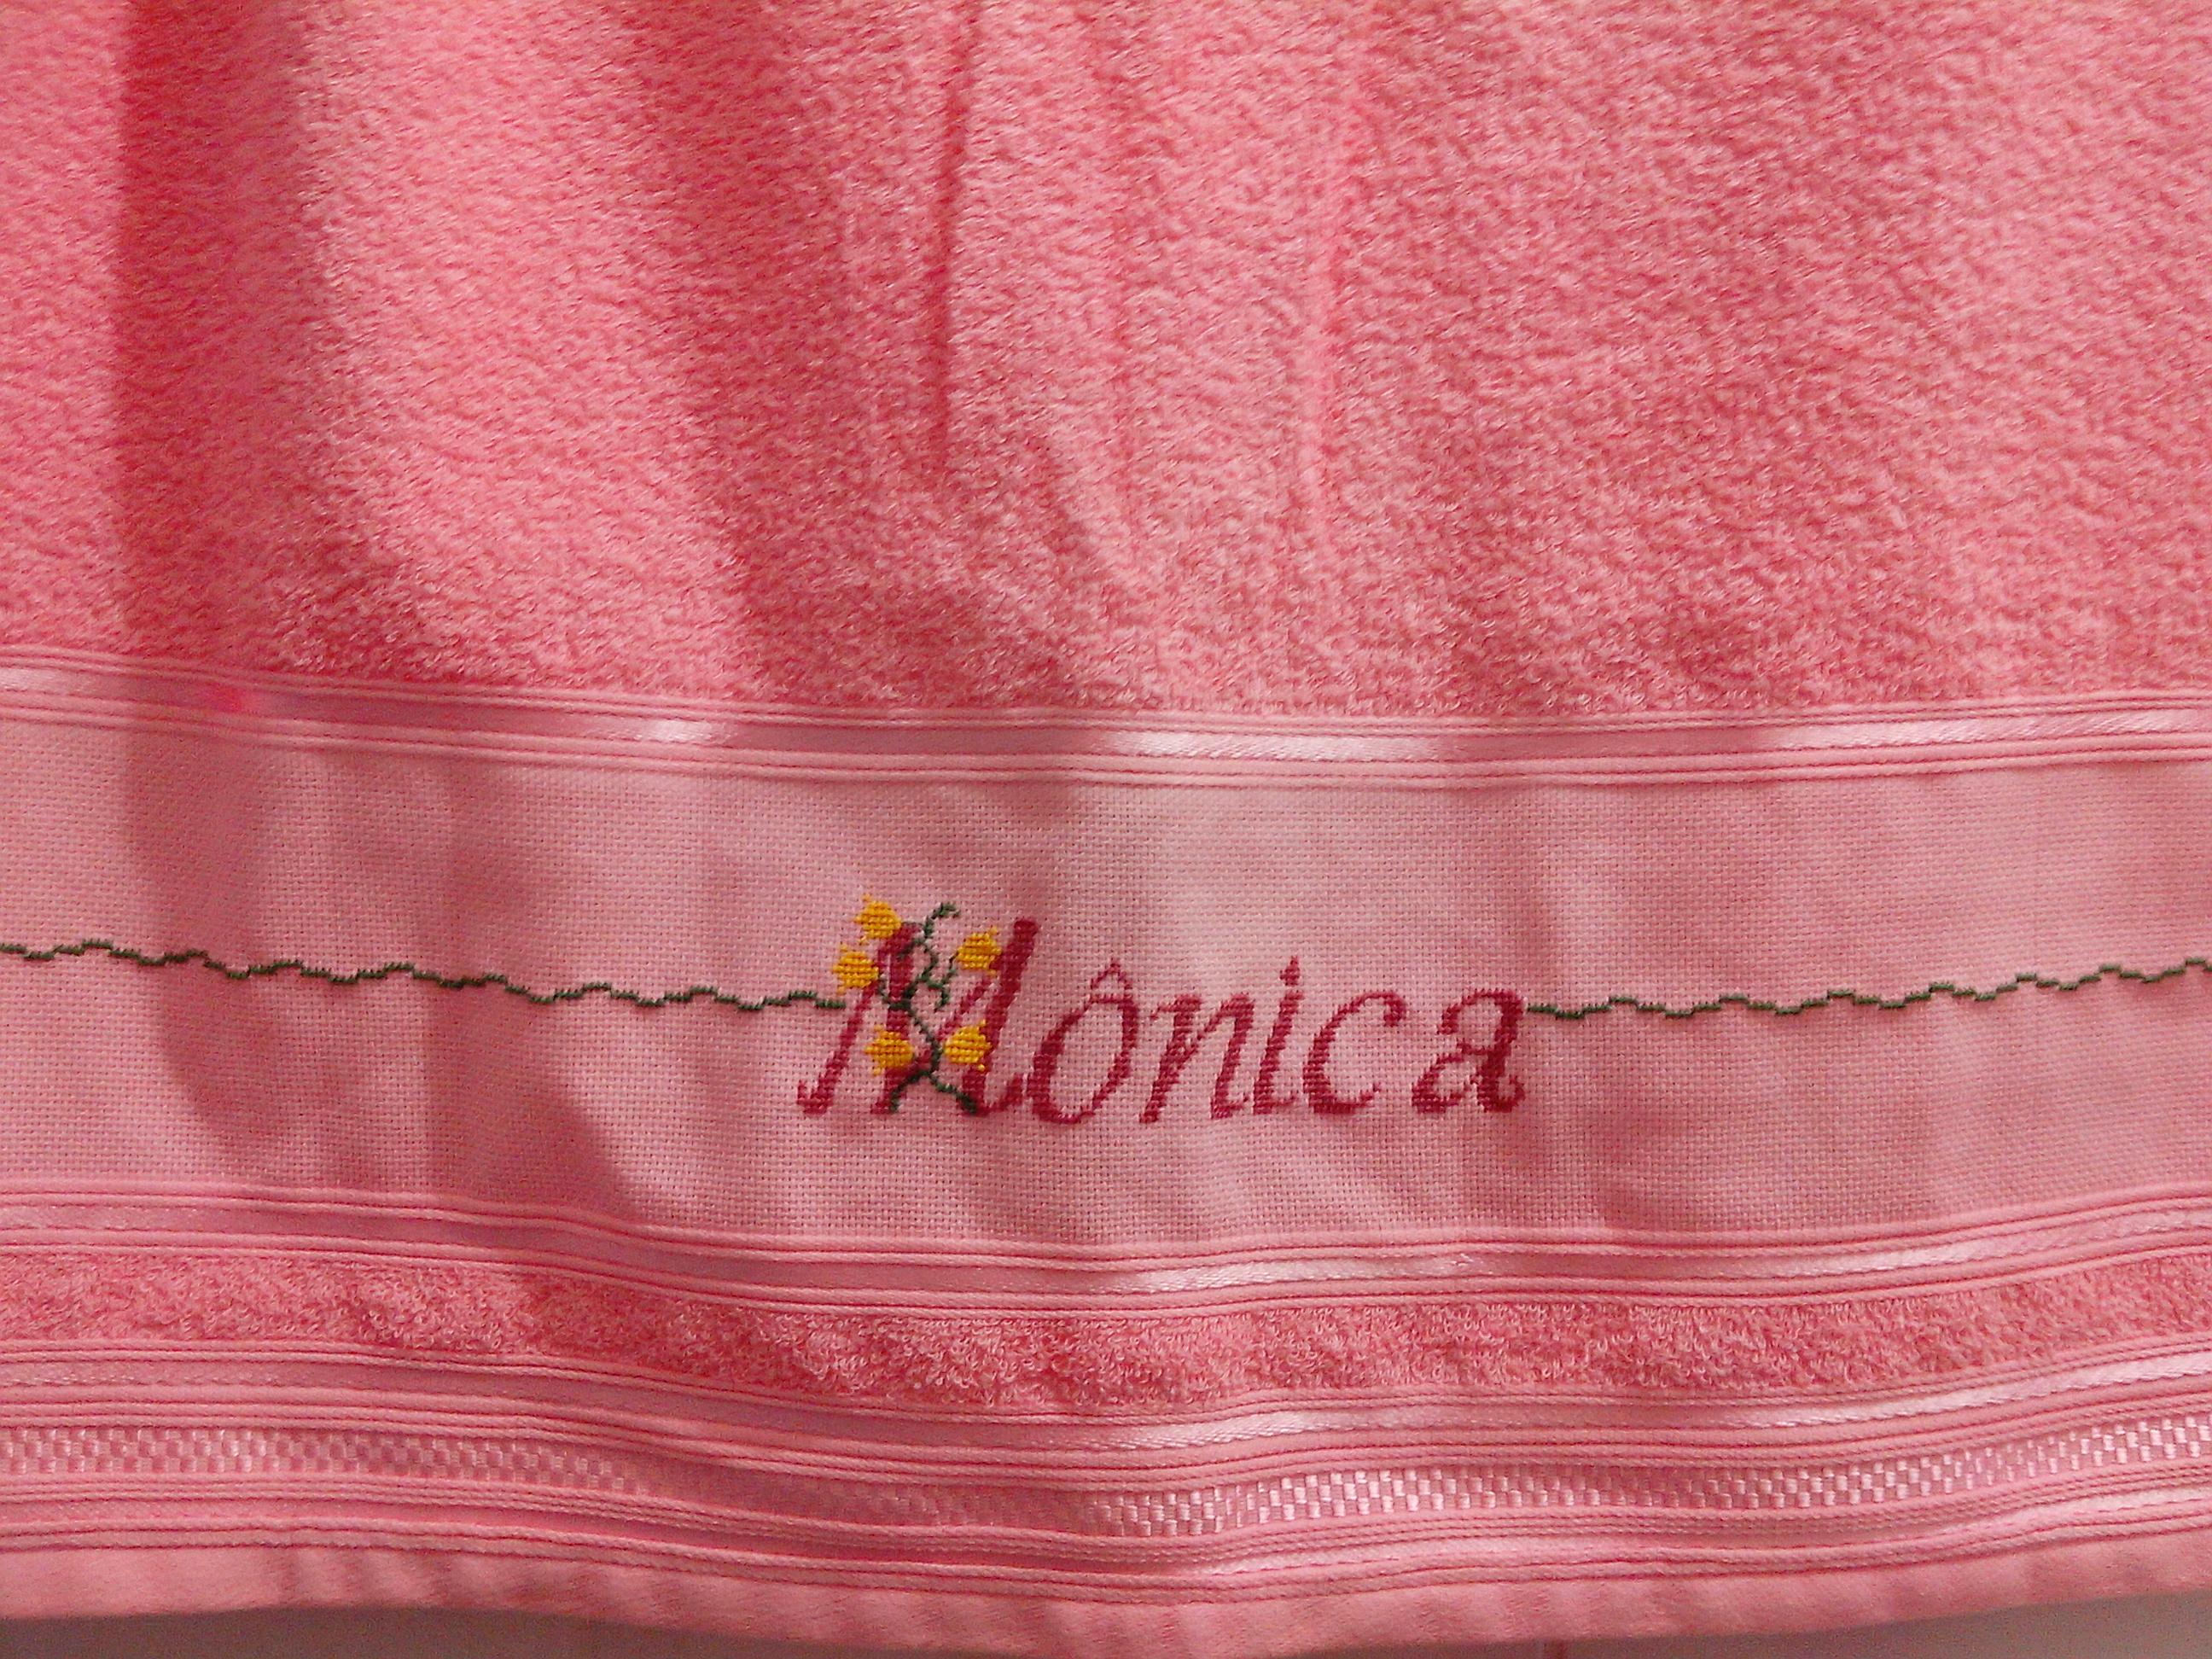 de banho toalha de banho monograma tulipa toalha de banho toalha de